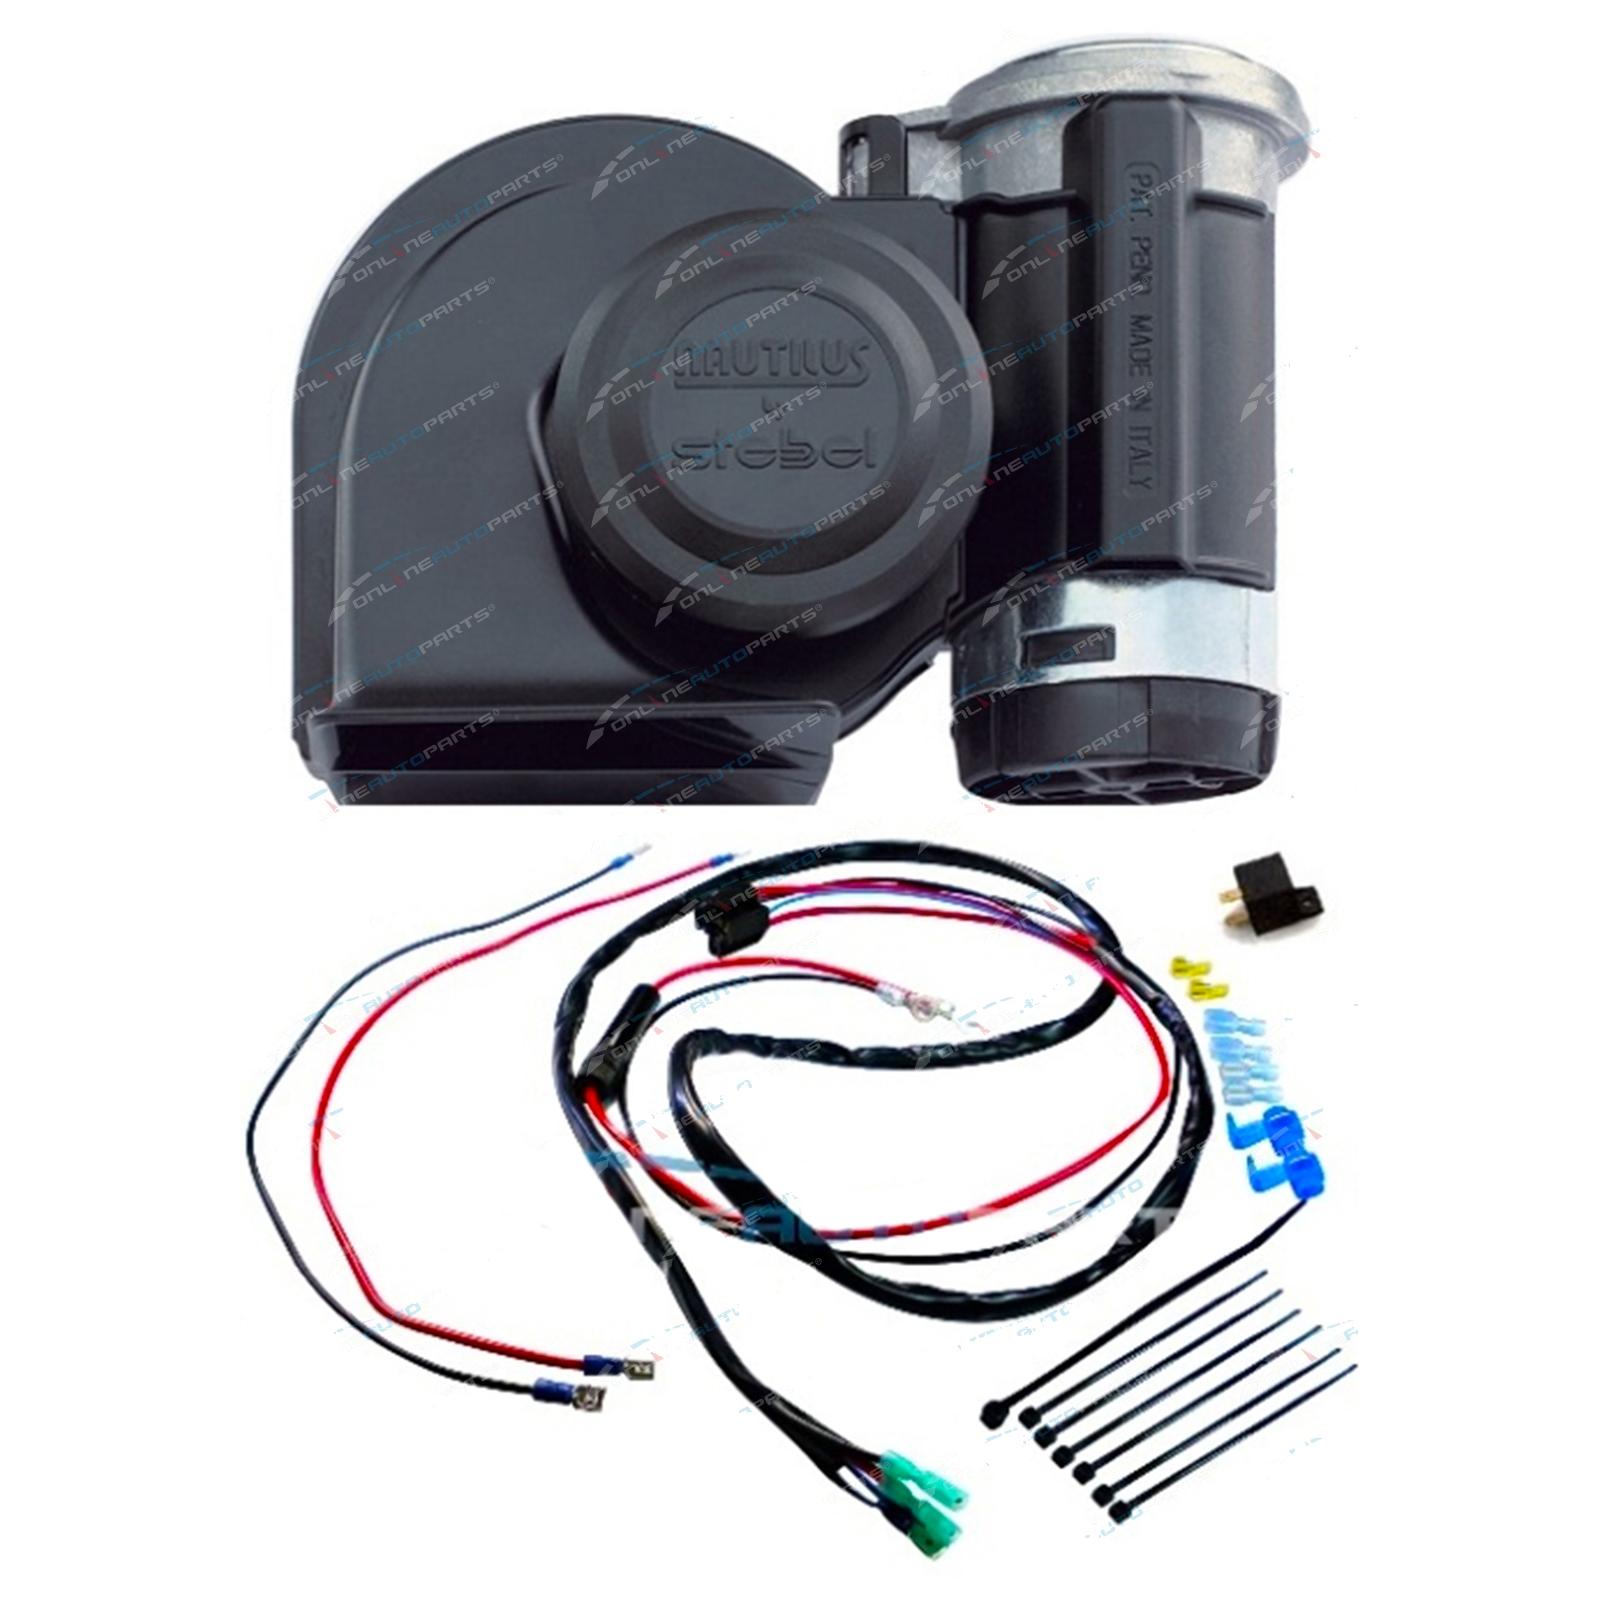 Stebel Nautilus Black Car Air Horn Kit 12 Volt 139db Incl